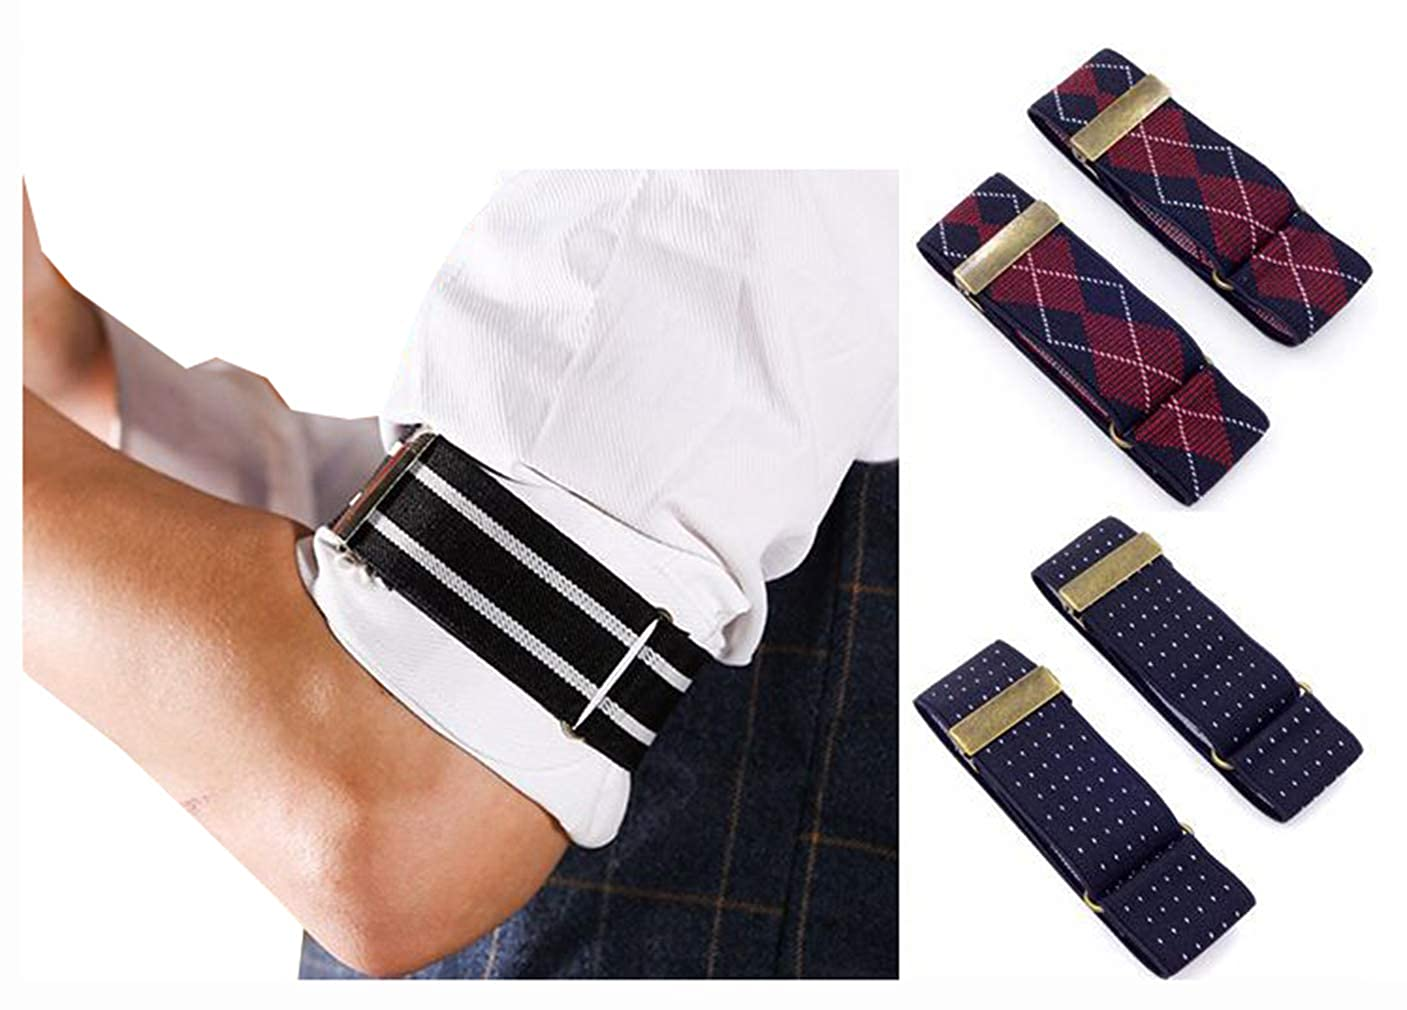 Mens 2 PCS Polka Dots Elastic Adjustable Sleeve Holders Armbands 1.4 Inch Width MNSP181248